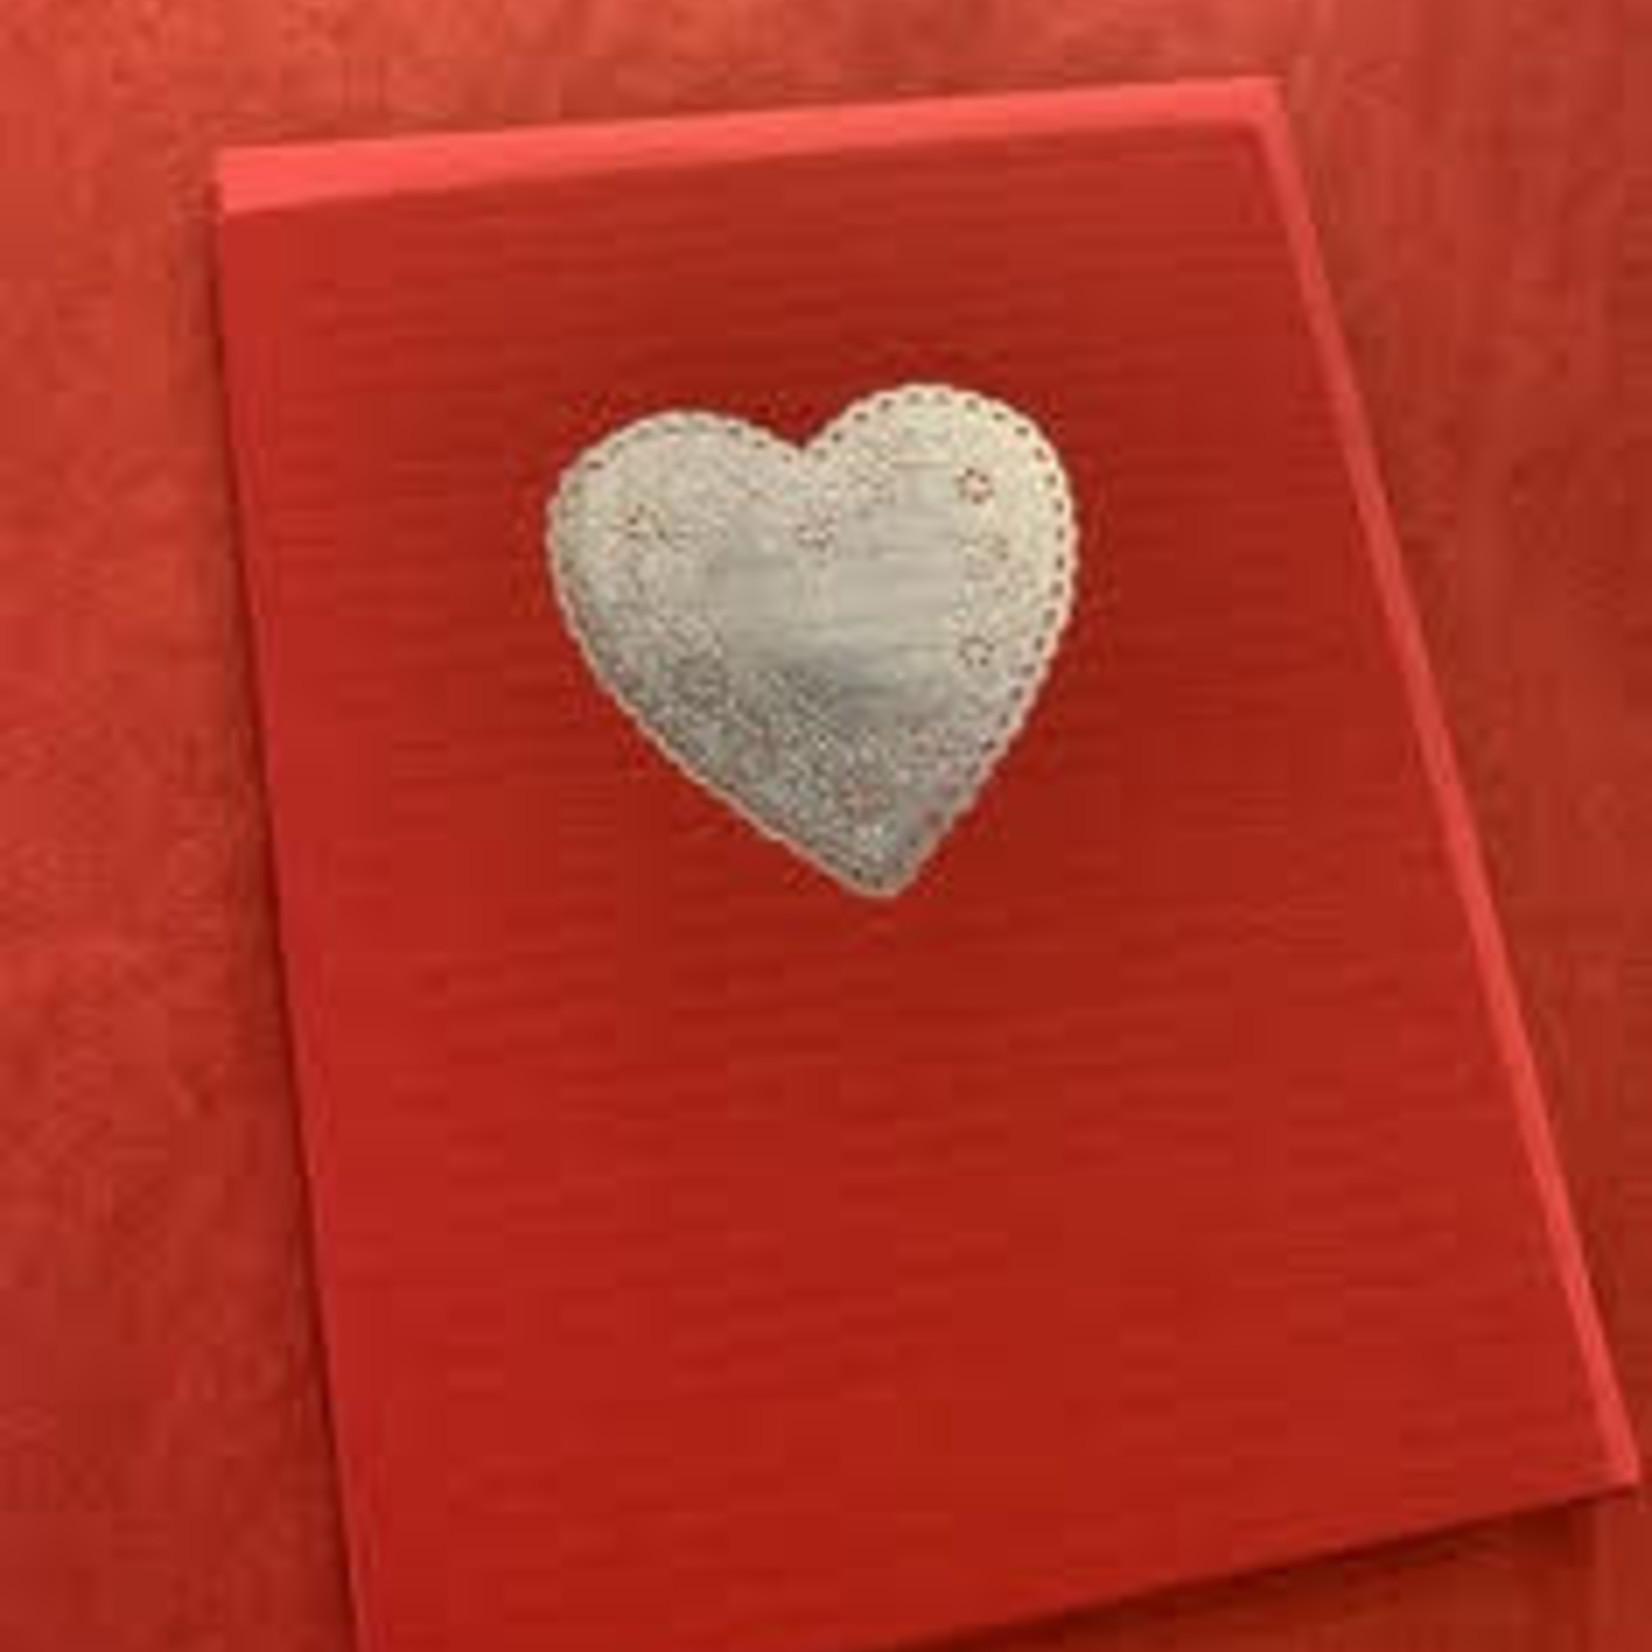 Big Wheel Press Heart Doilie Silver Foil Greeting Card